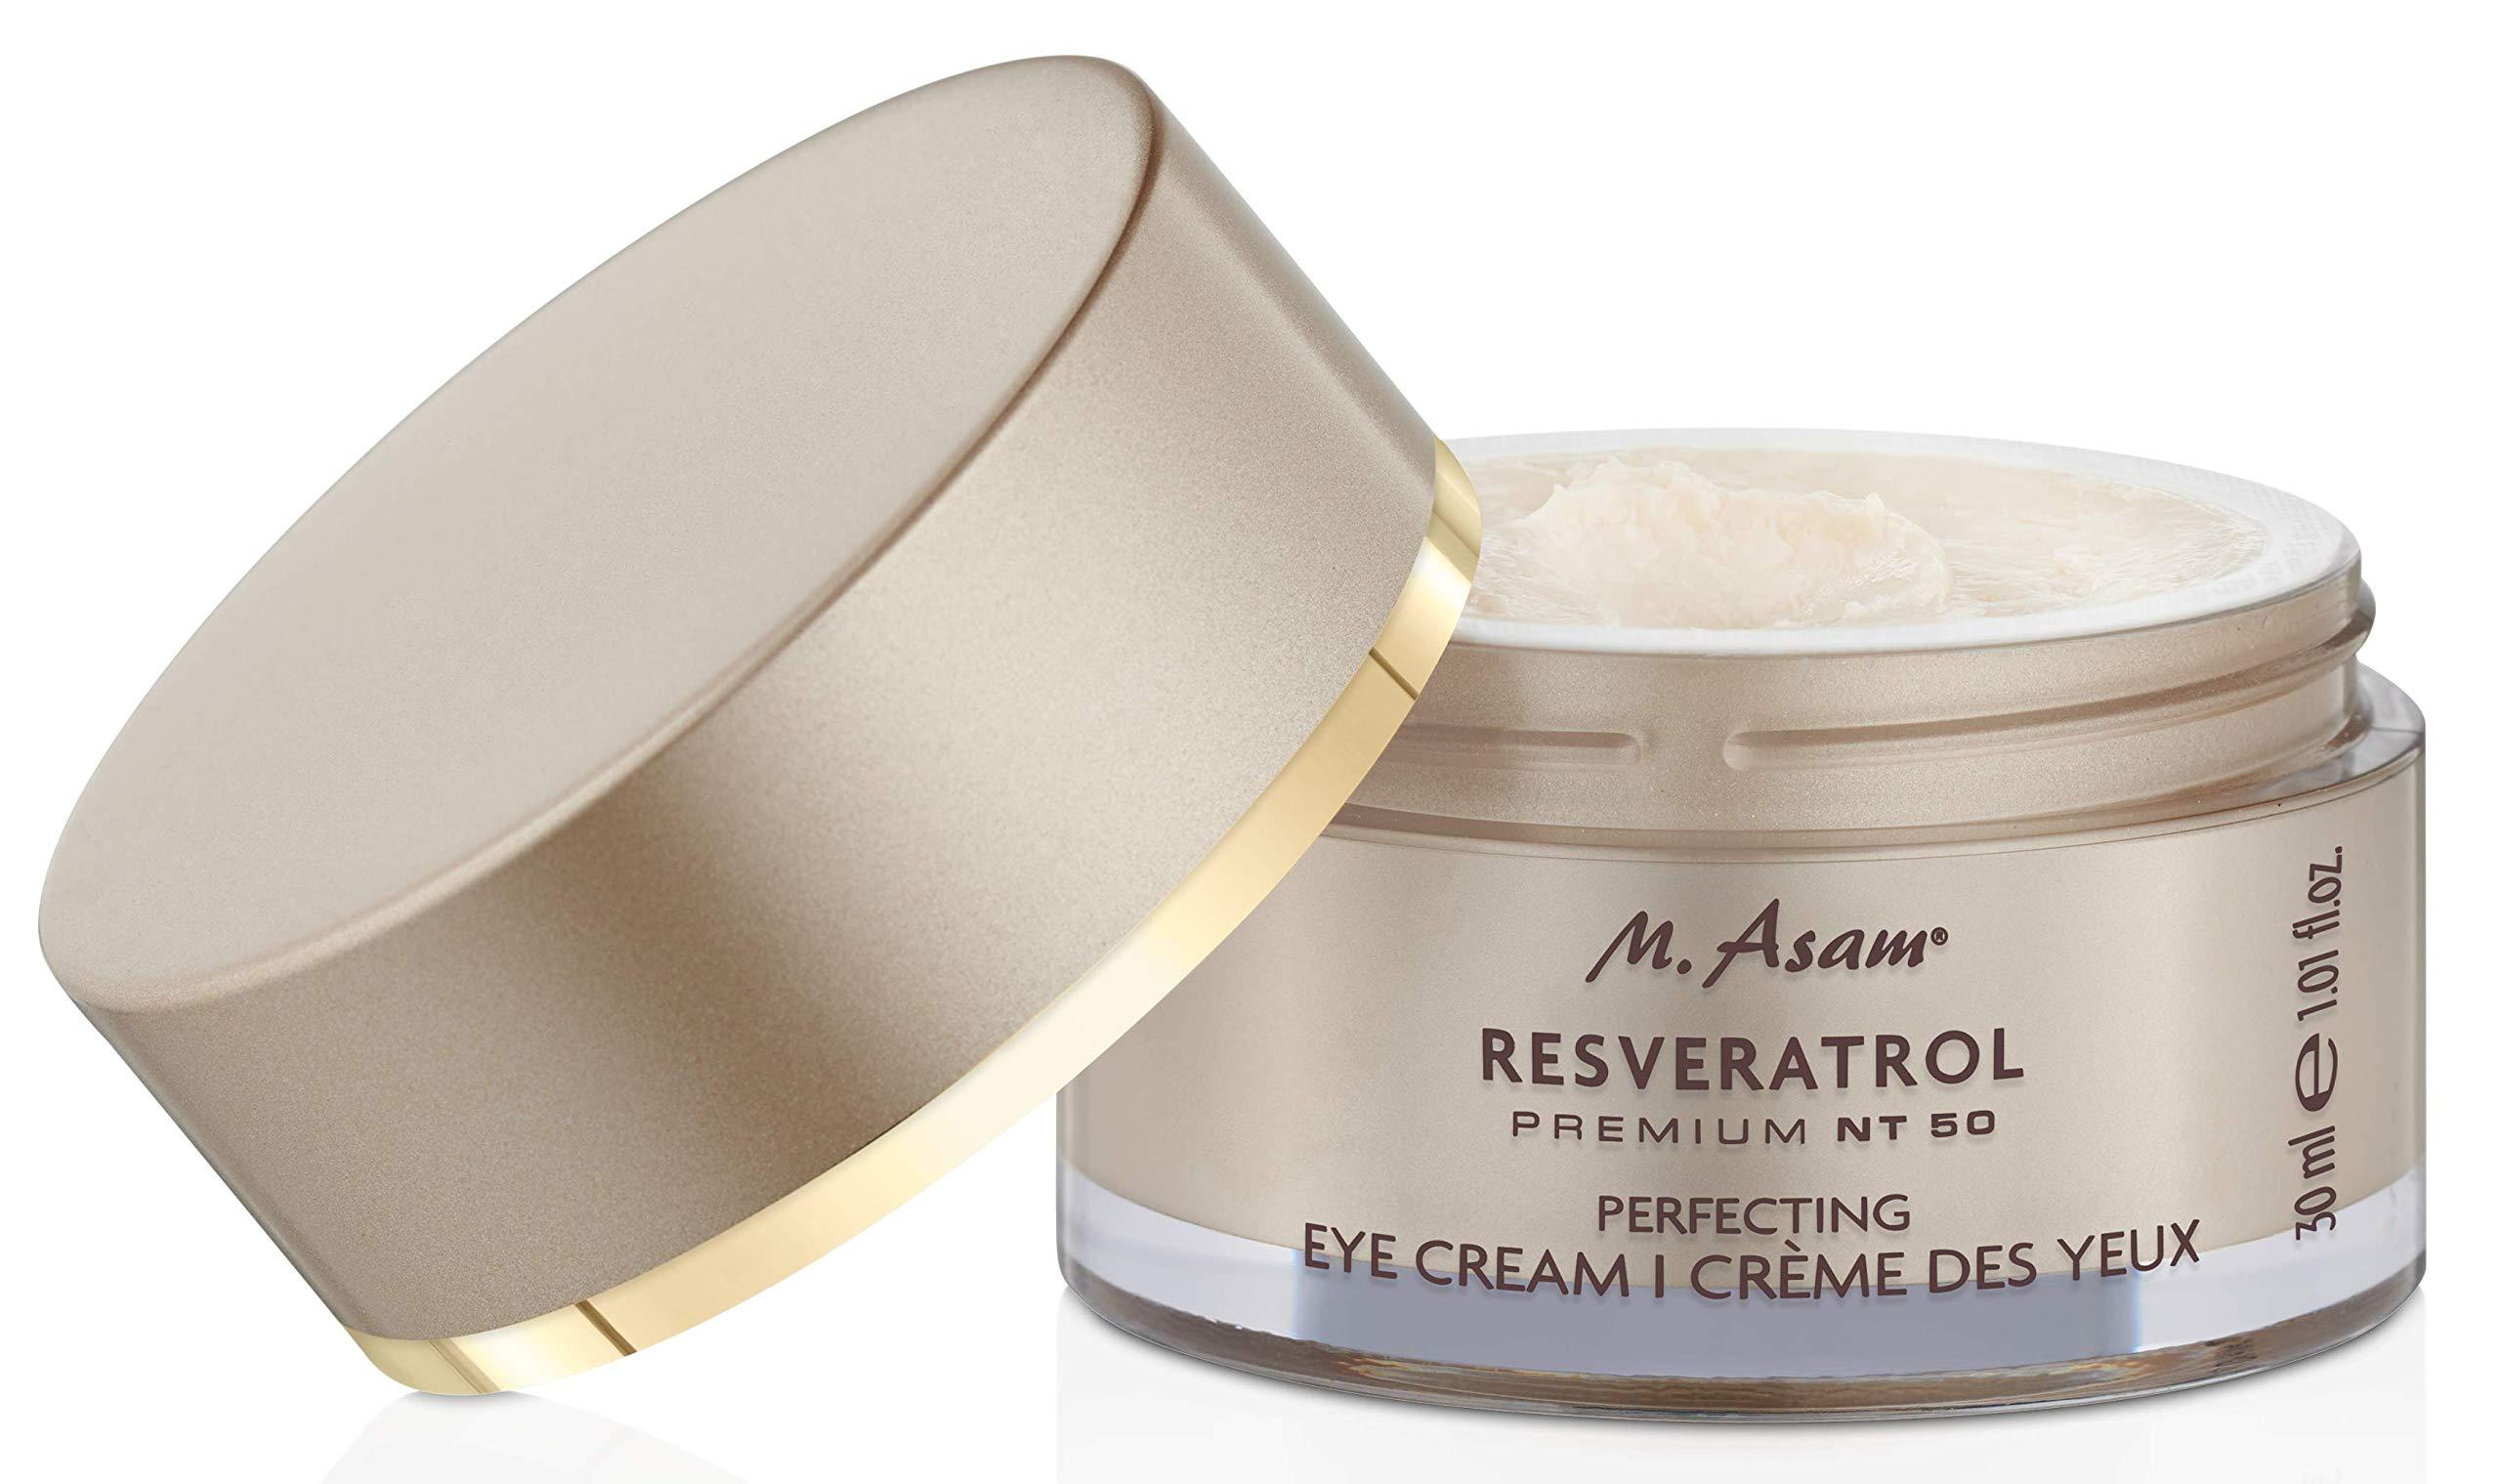 M. Asam, Resveratrol NT50, Anti-Aging Perfecting Eye Cream..